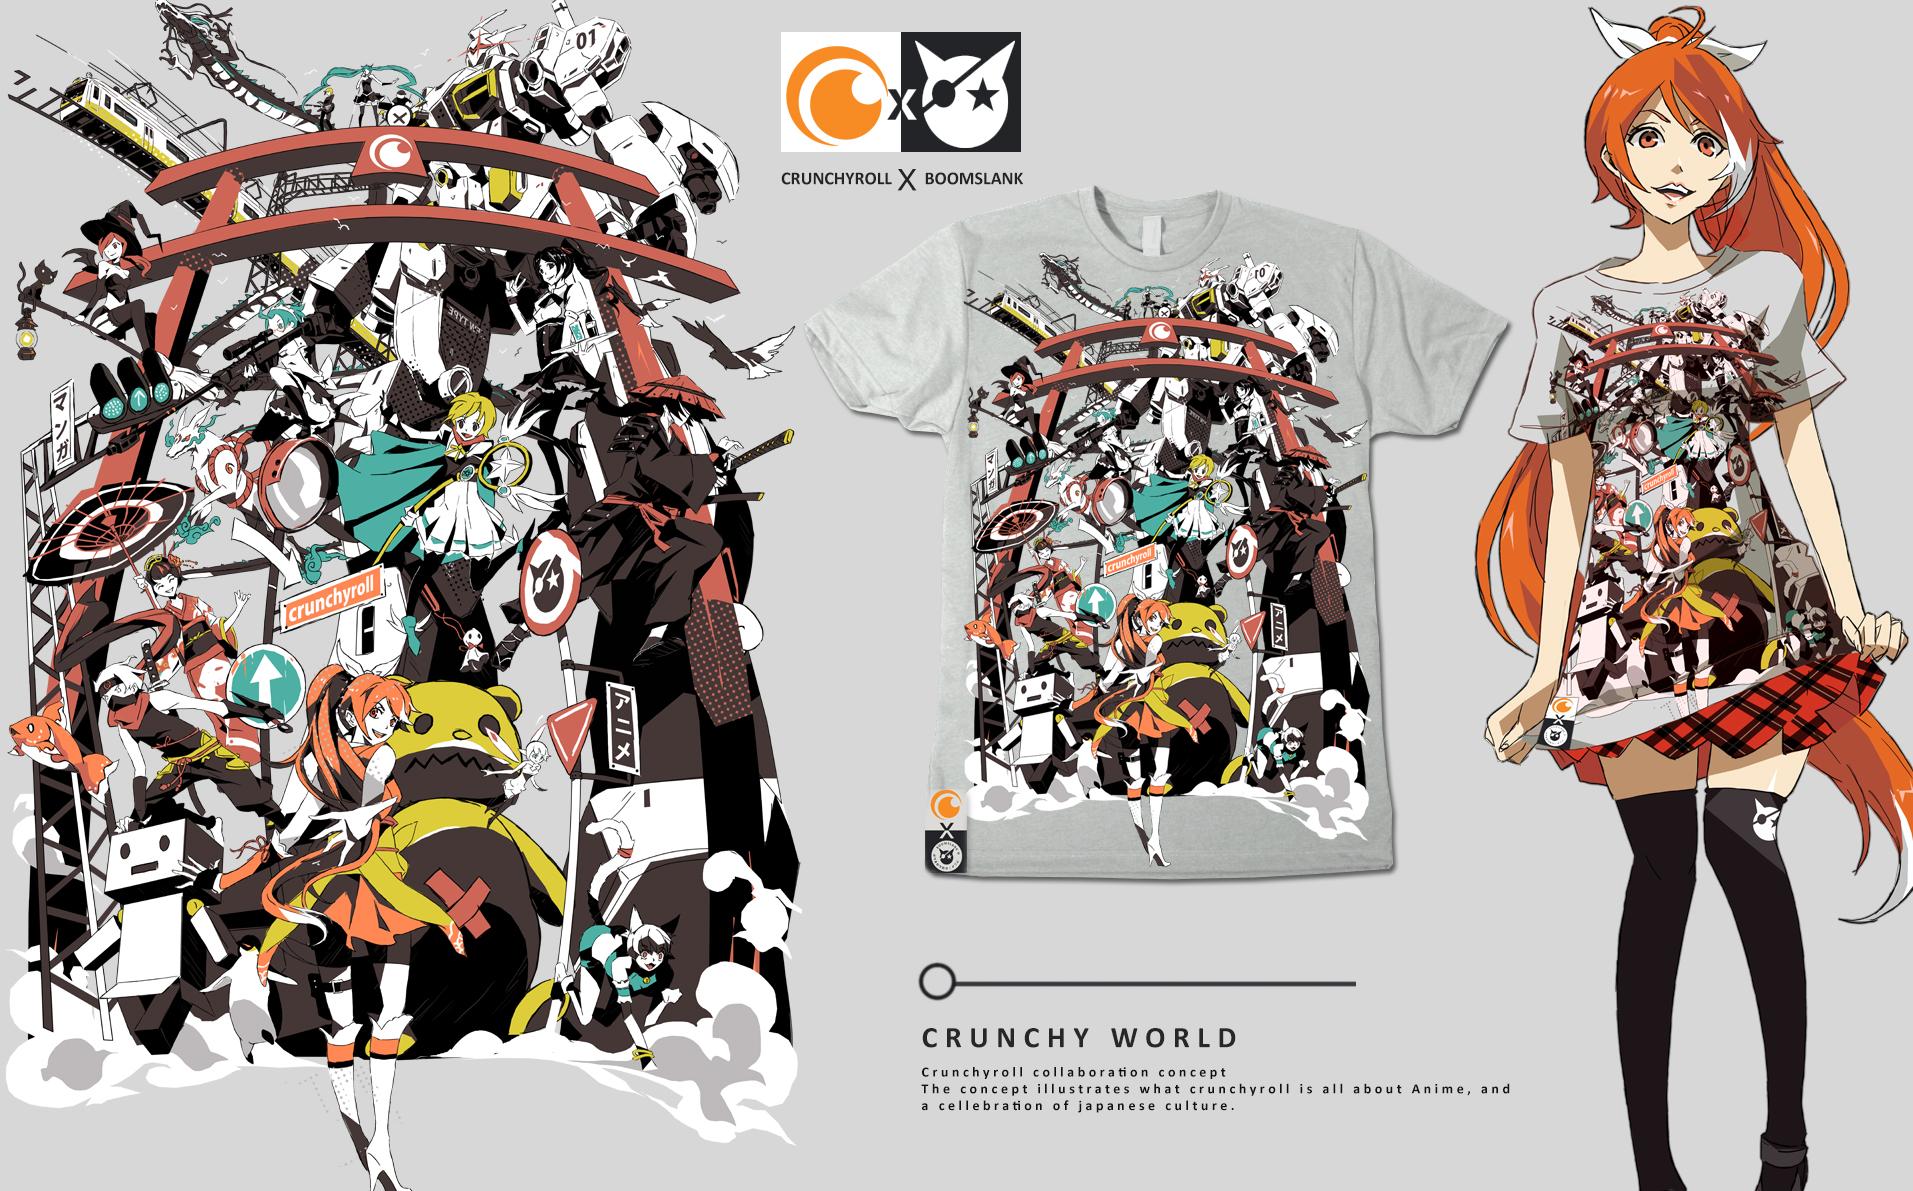 CRUNCHYROLL X BOOMSLANK By P Shinobi